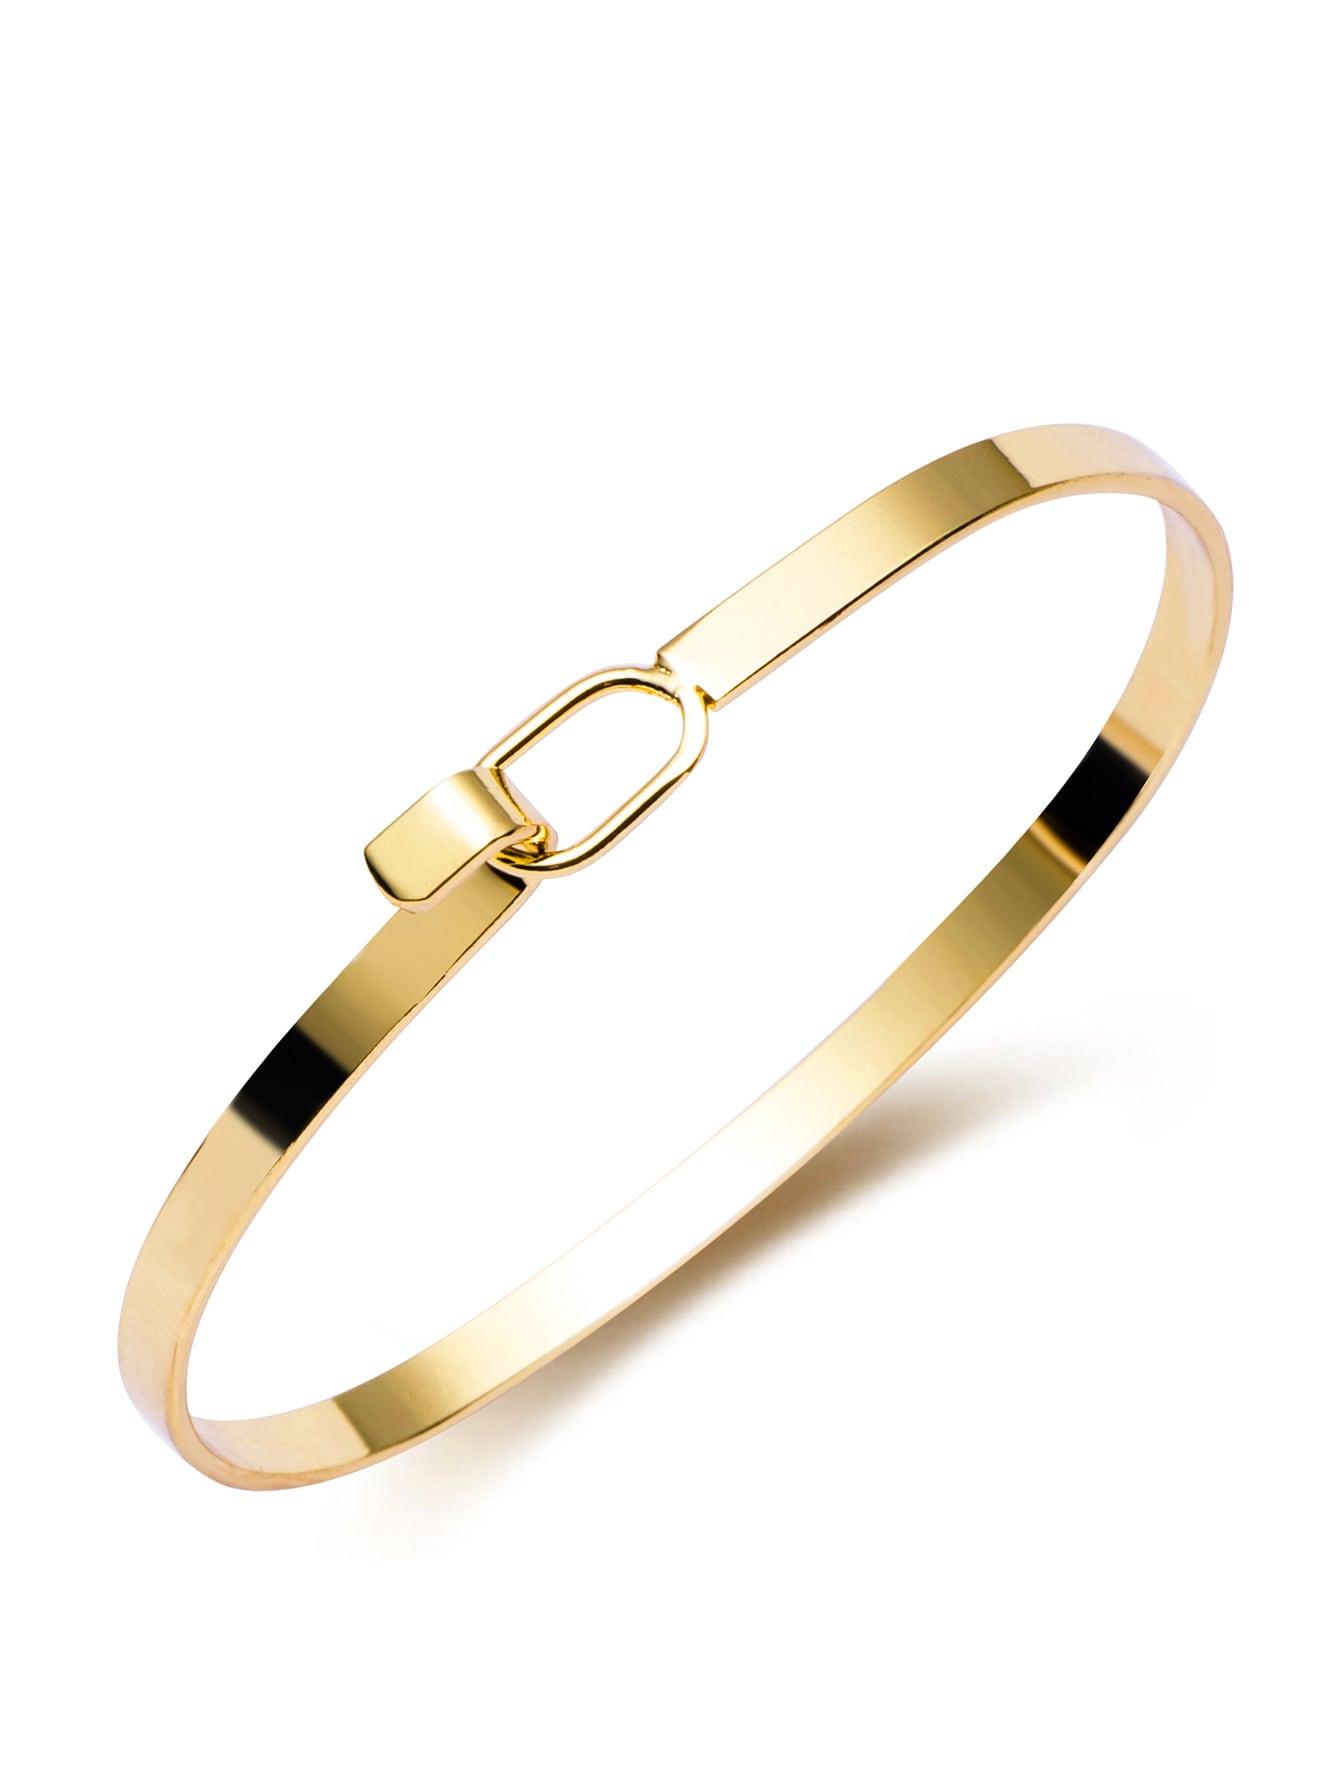 Gold Plated Buckled Minimalist Open Bracelet